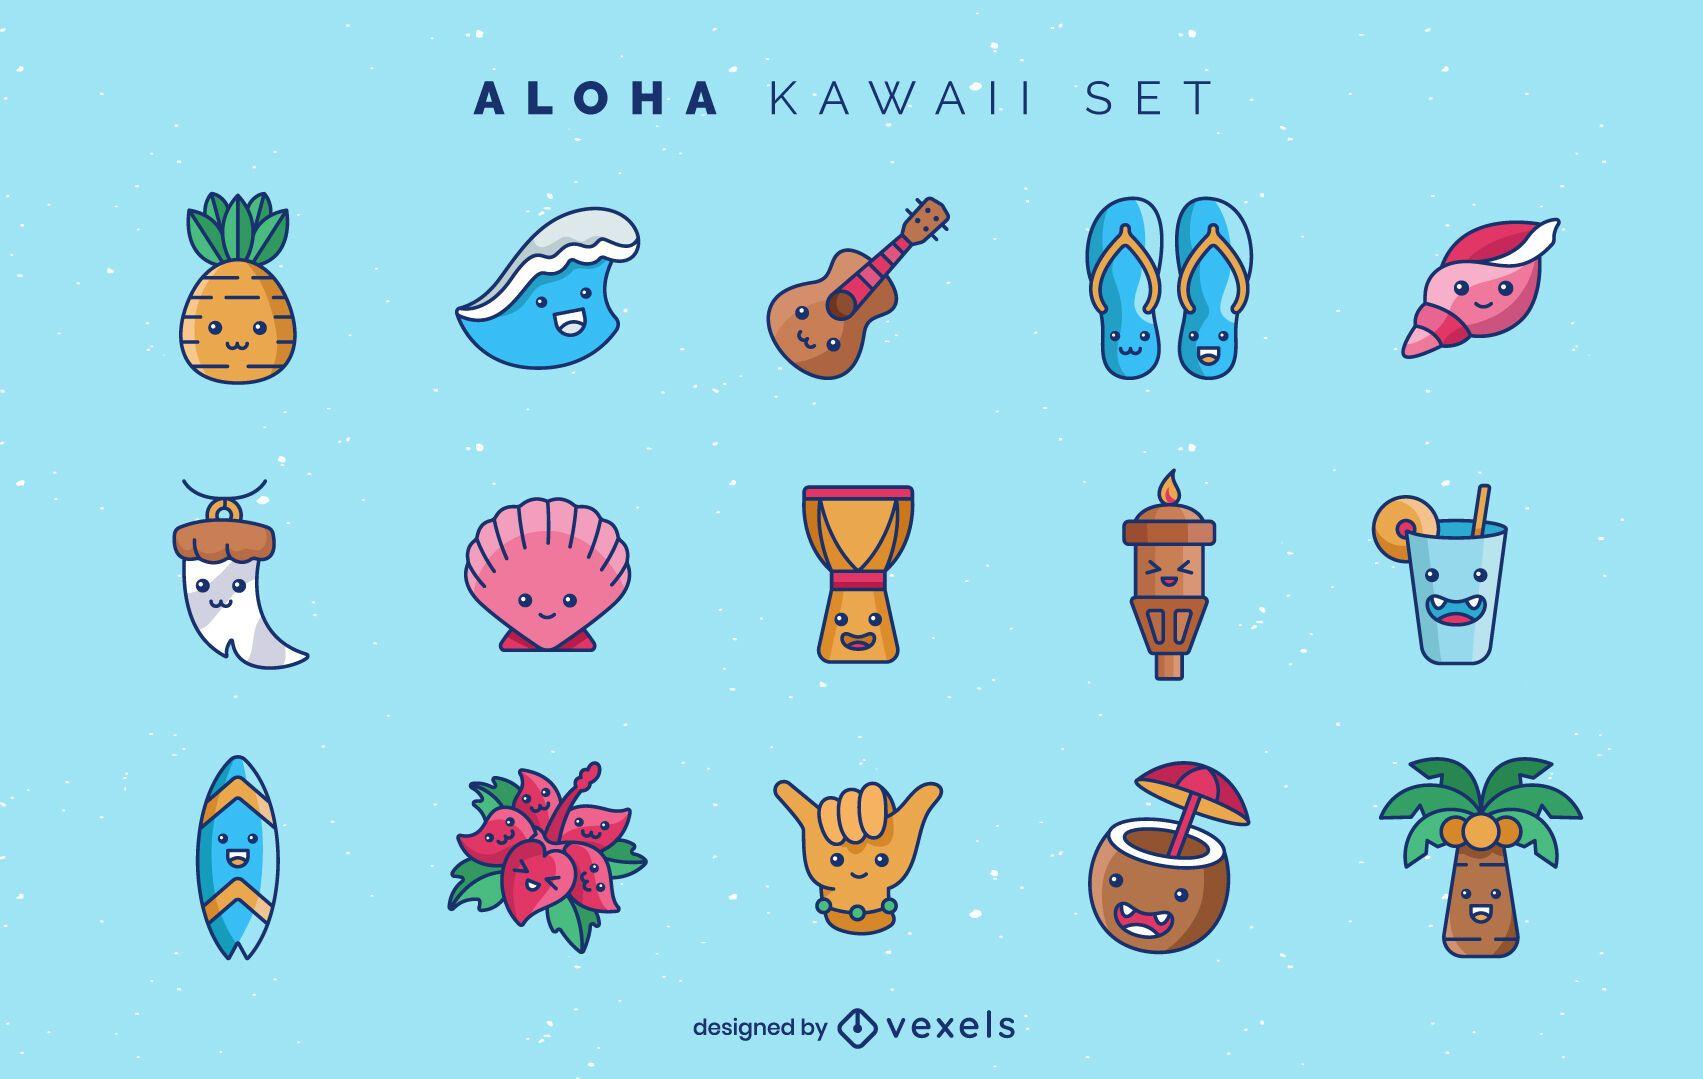 Aloha kawaii elements set